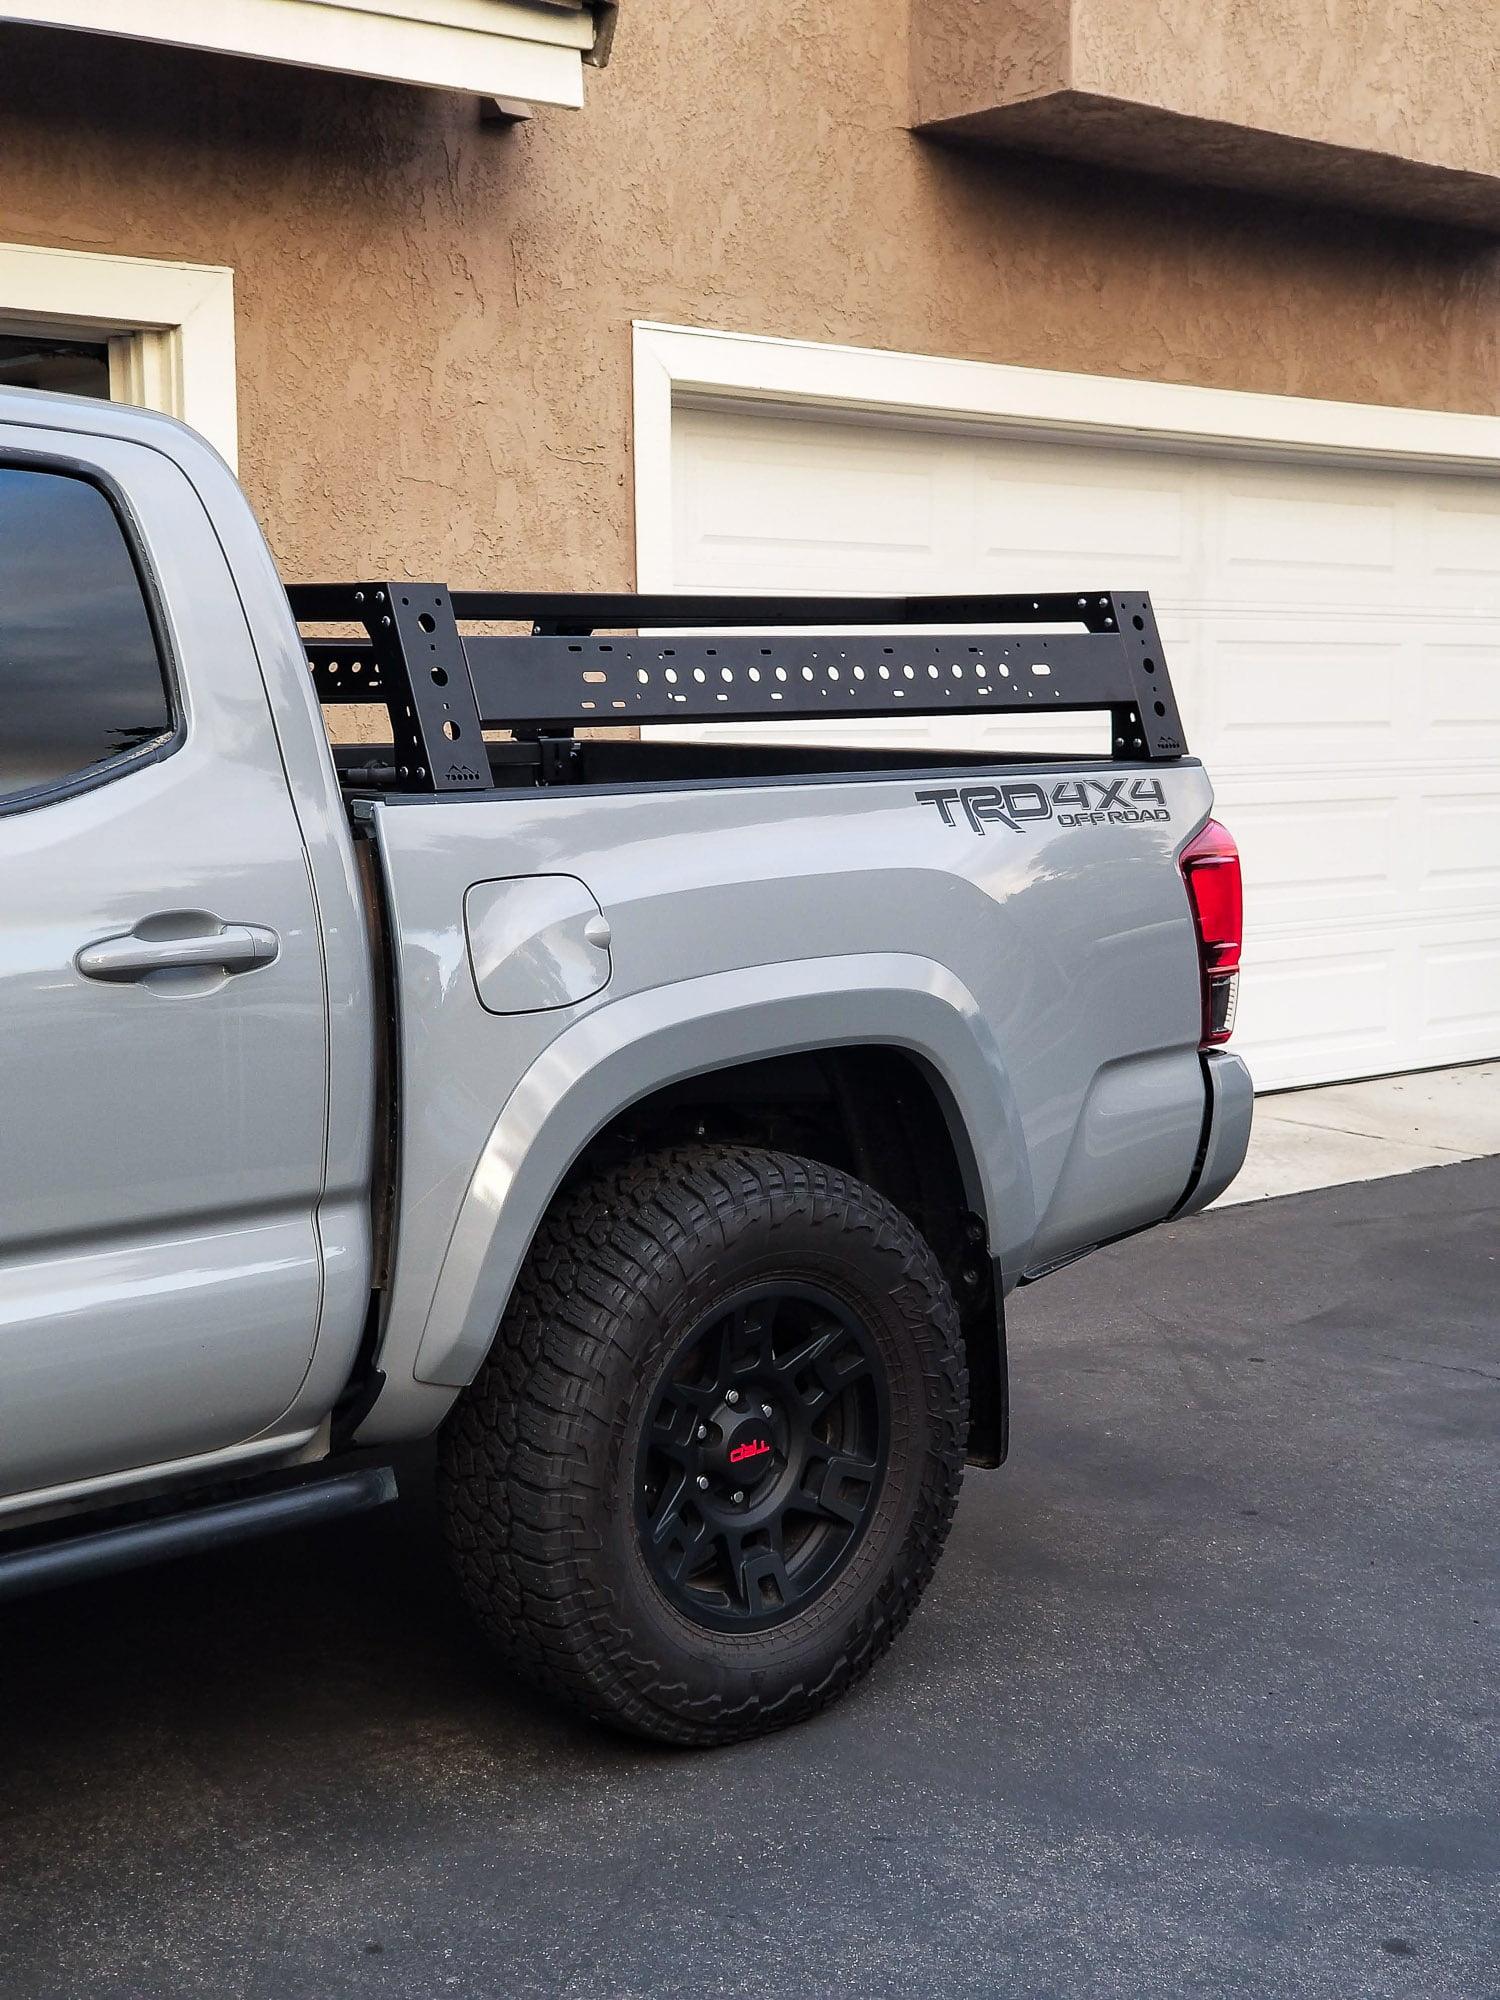 Toyota Tacoma Bed Rack - MAX Modular